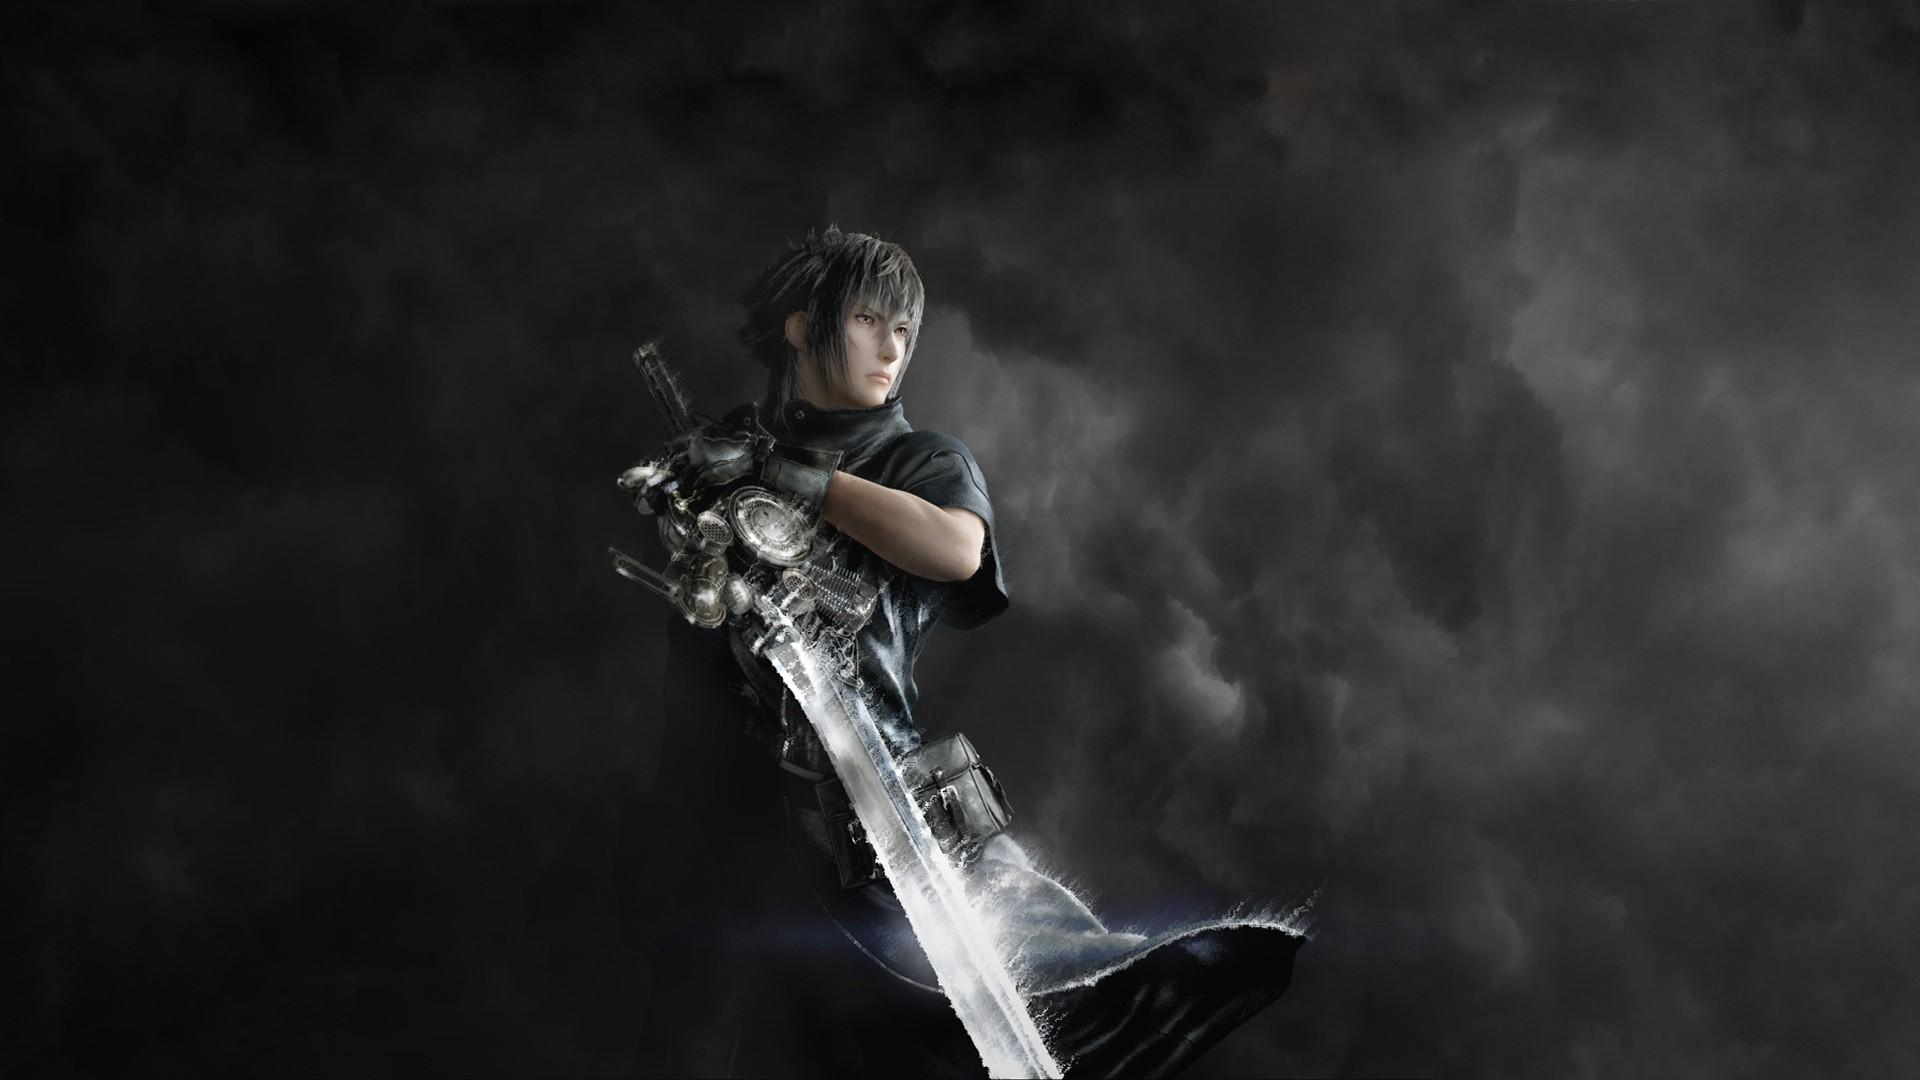 Final Fantasy Xv Wallpaper Iphone X Final Fantasy Versus Xiii Full Hd Fond D 233 Cran And Arri 232 Re